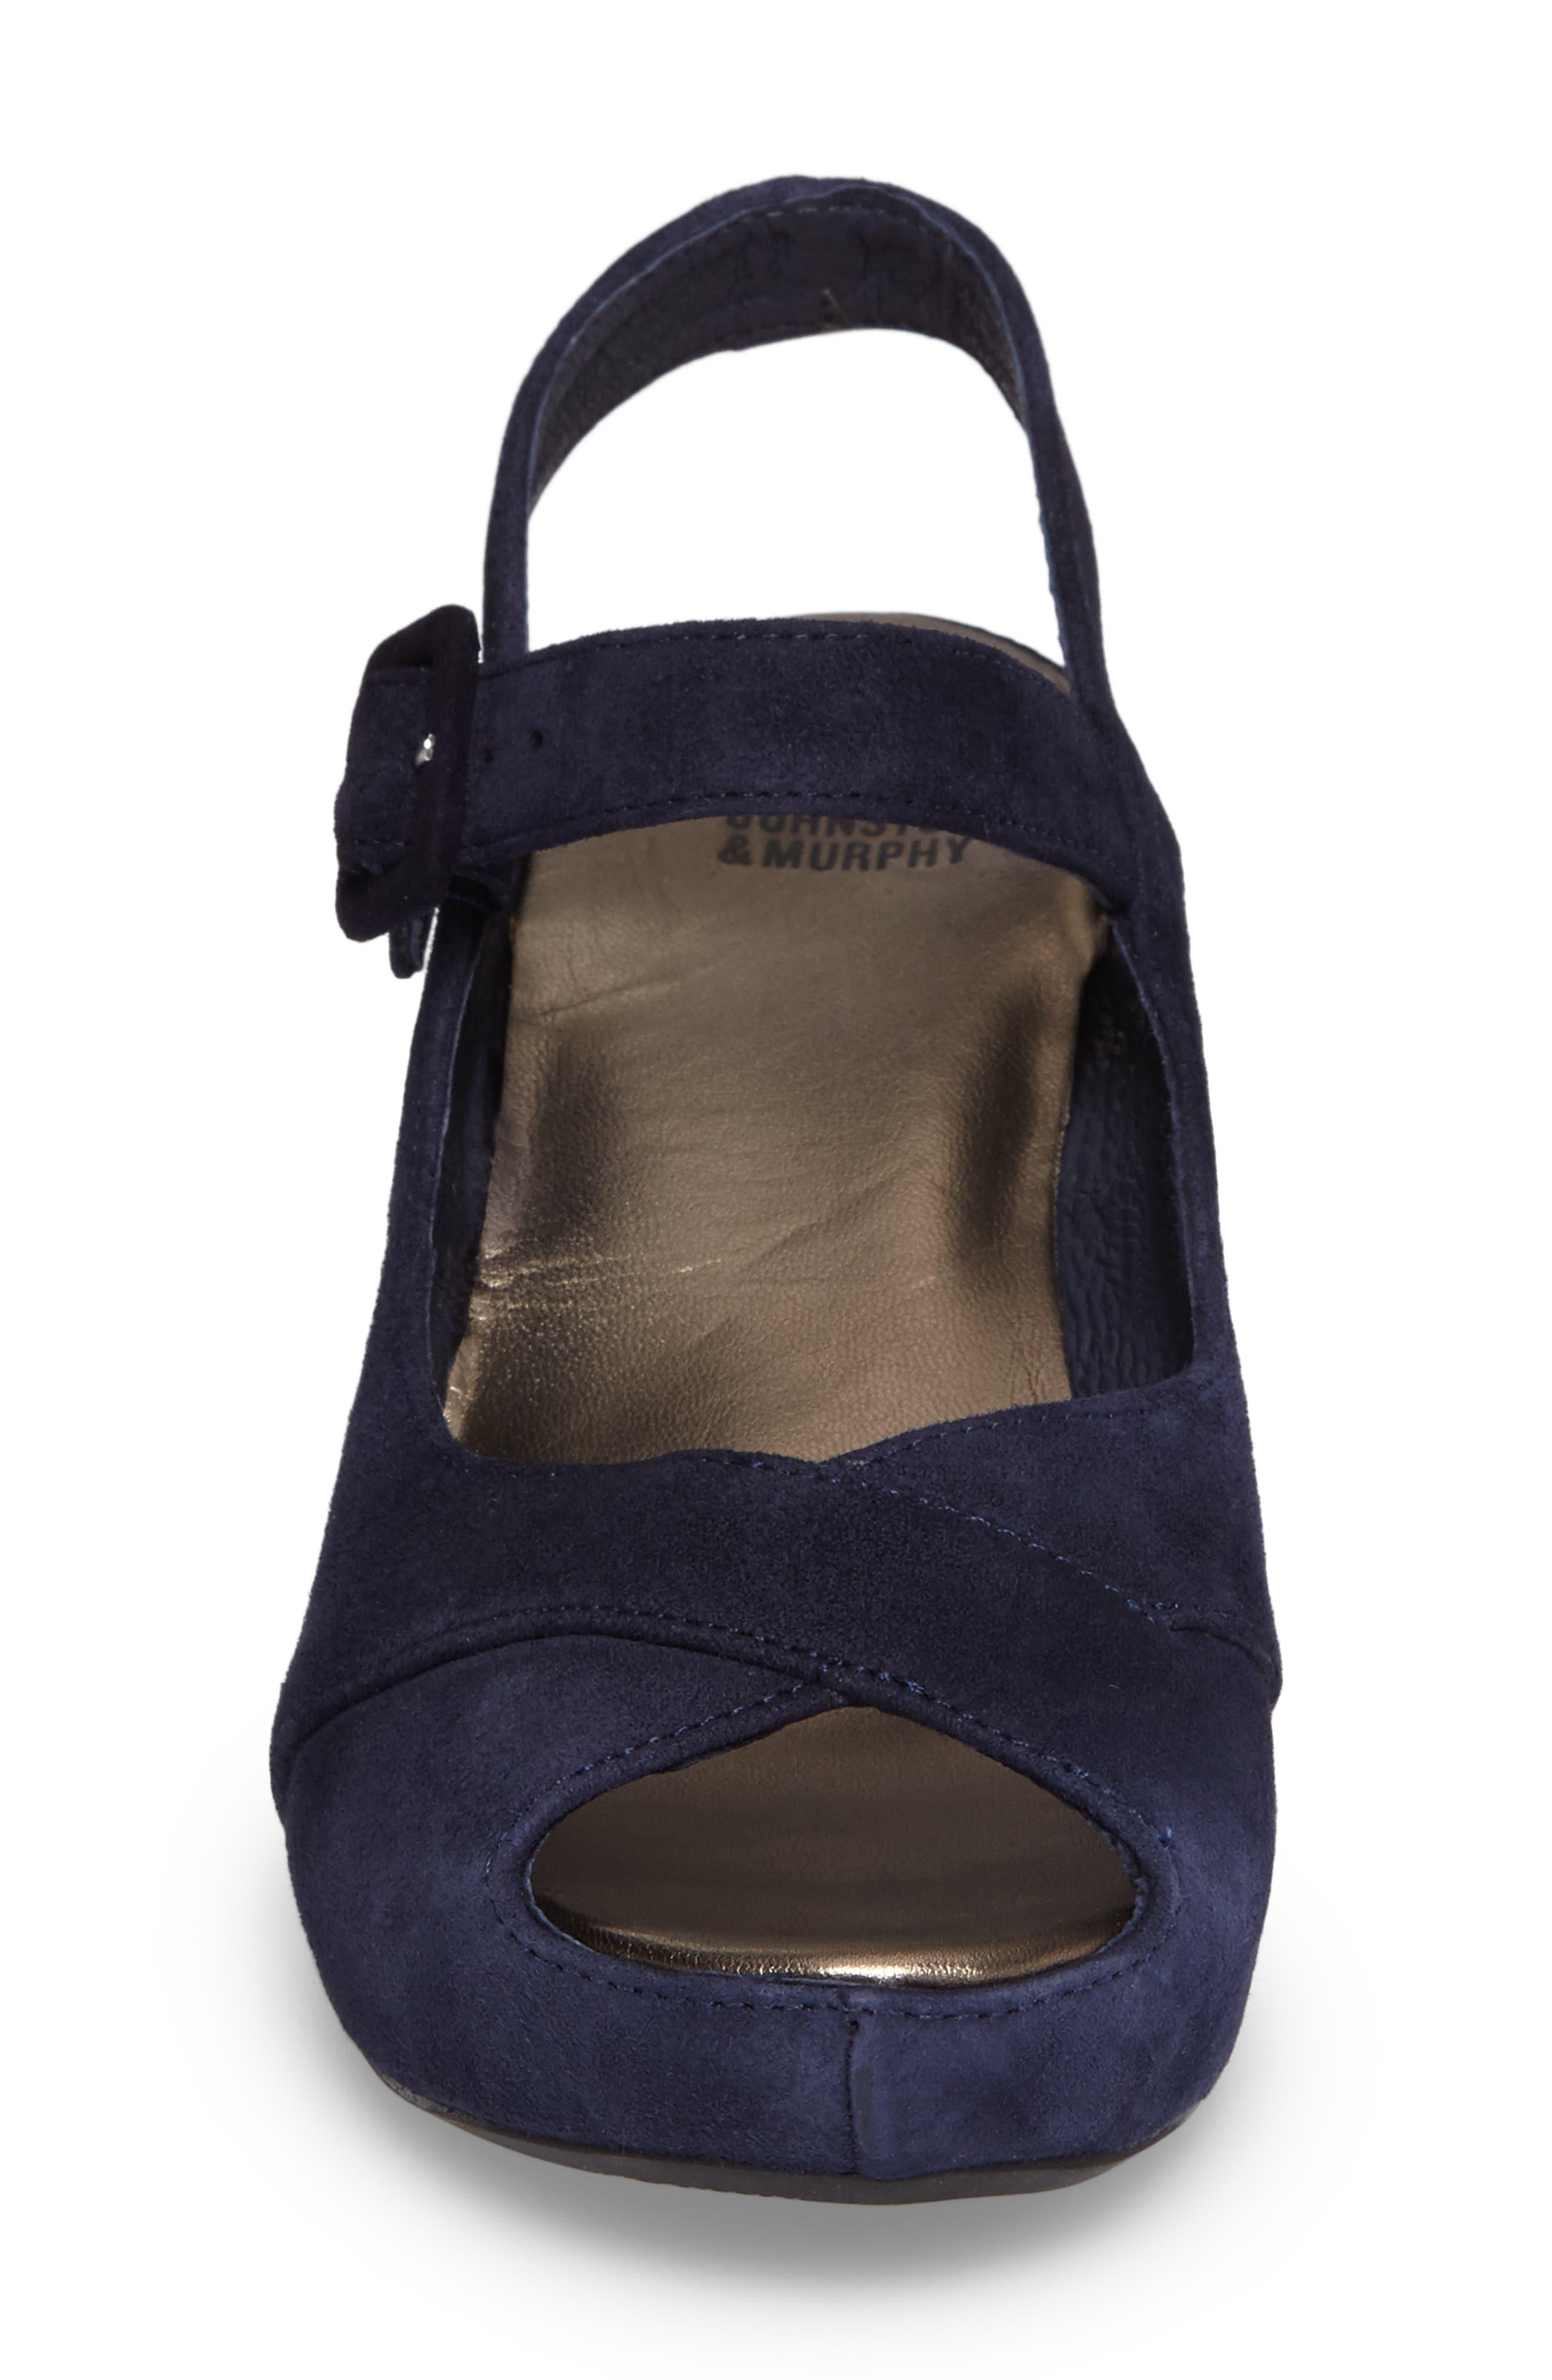 Tara Platform Wedge Sandal,                             Alternate thumbnail 4, color,                             NAVY SUEDE